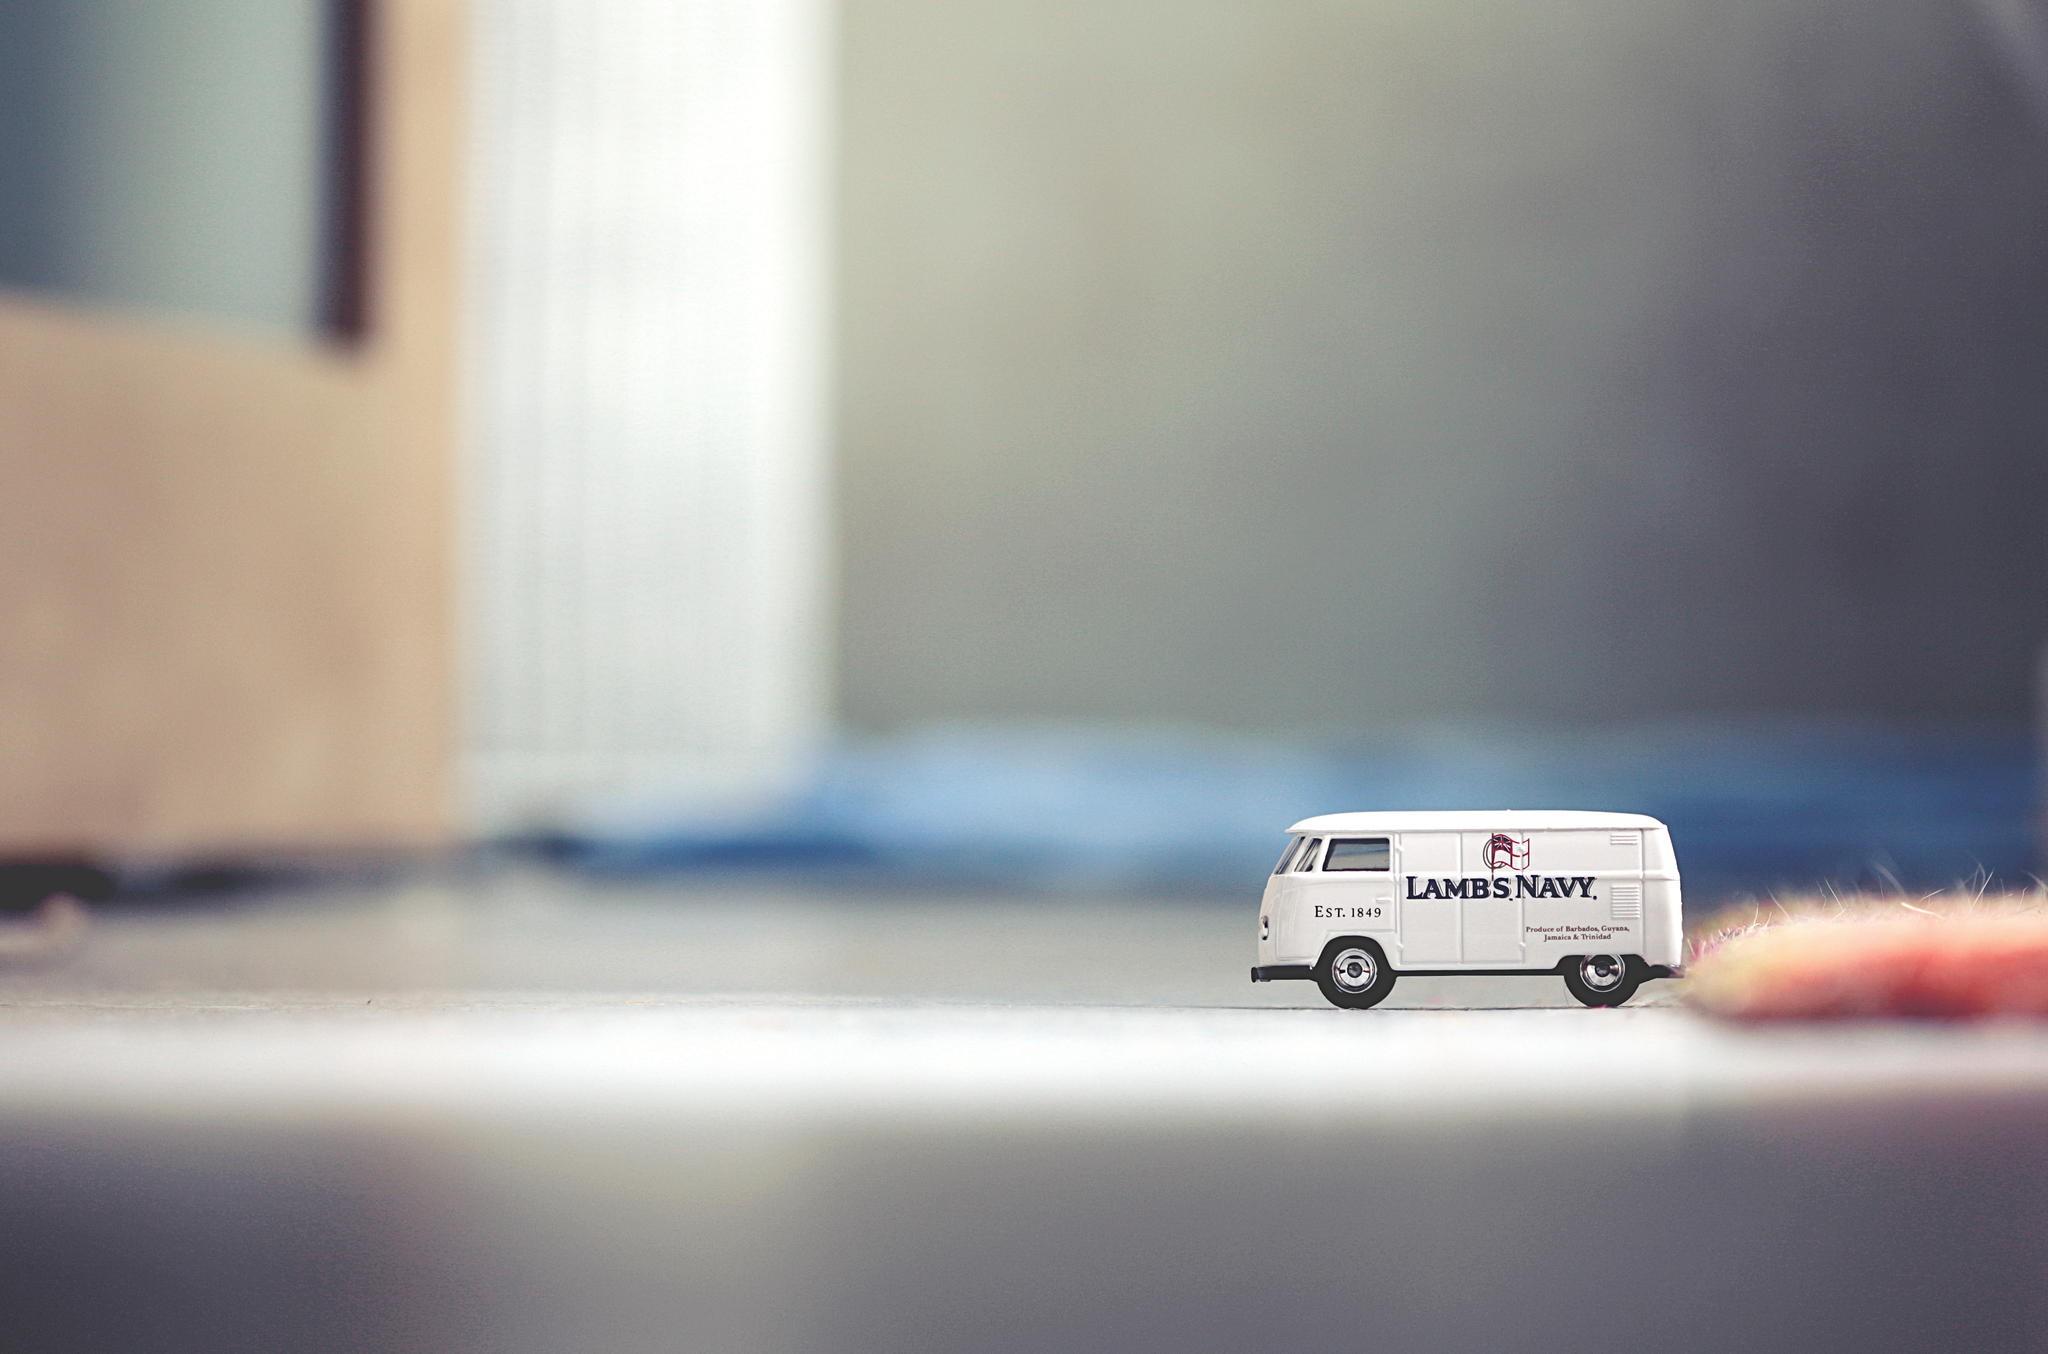 General 2048x1354 car macro toys indoors vehicle